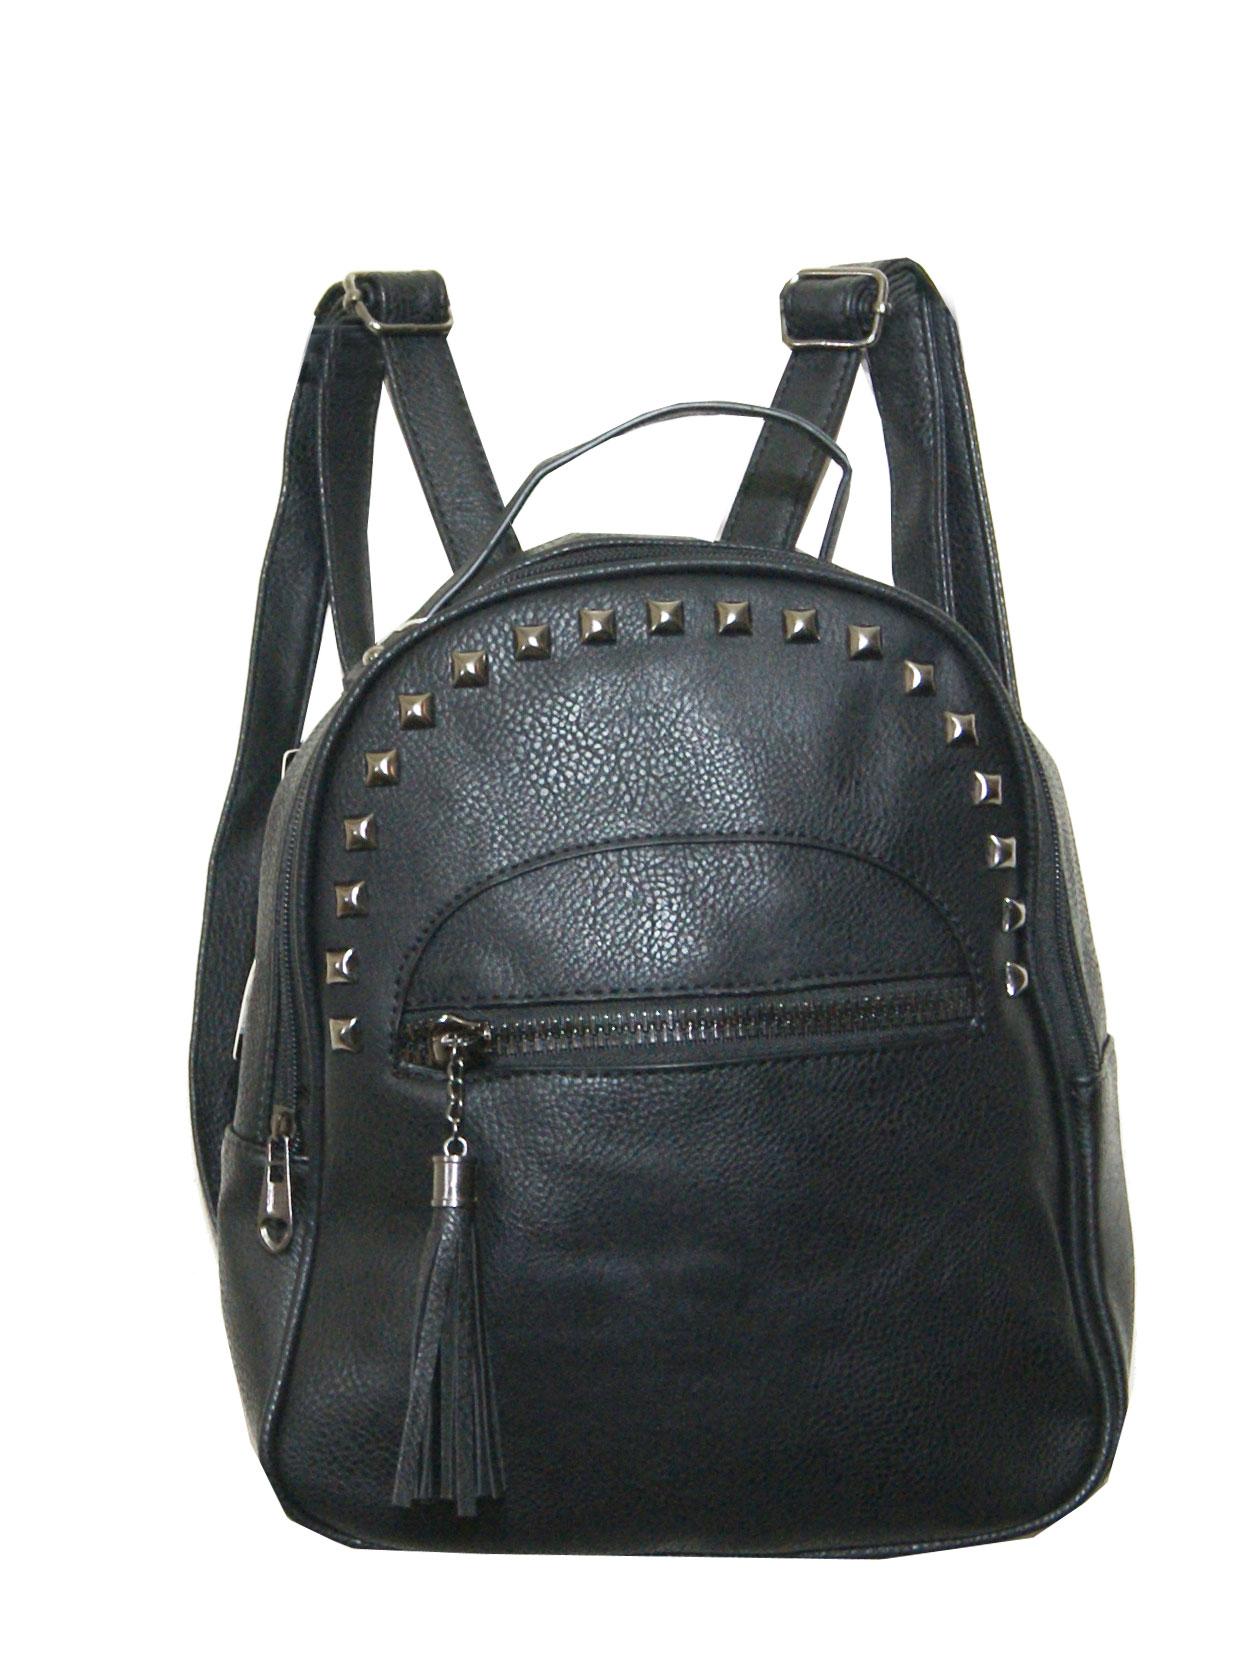 Backpack No 723 - Μαύρο (Sivio 723)